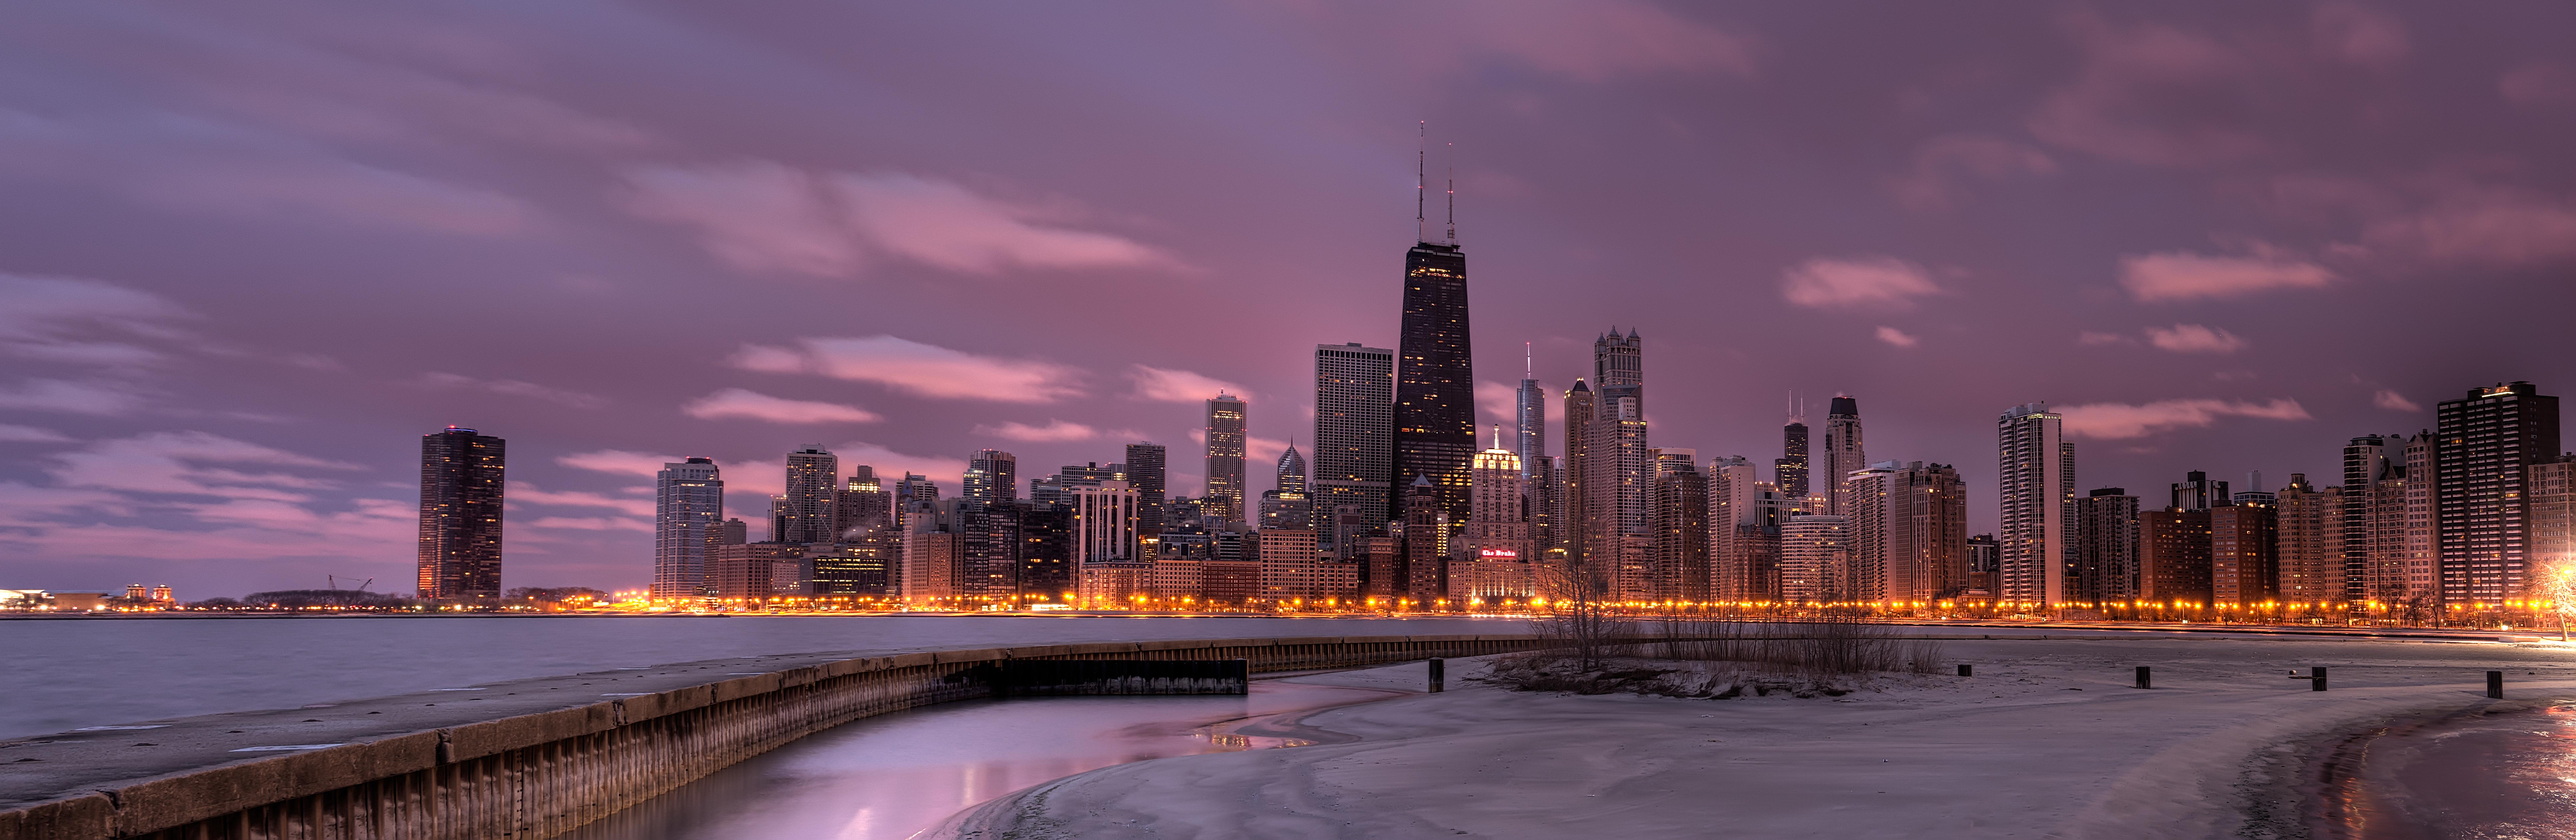 Chicago_Skyline_at_Sunrise_Dave_Wilson